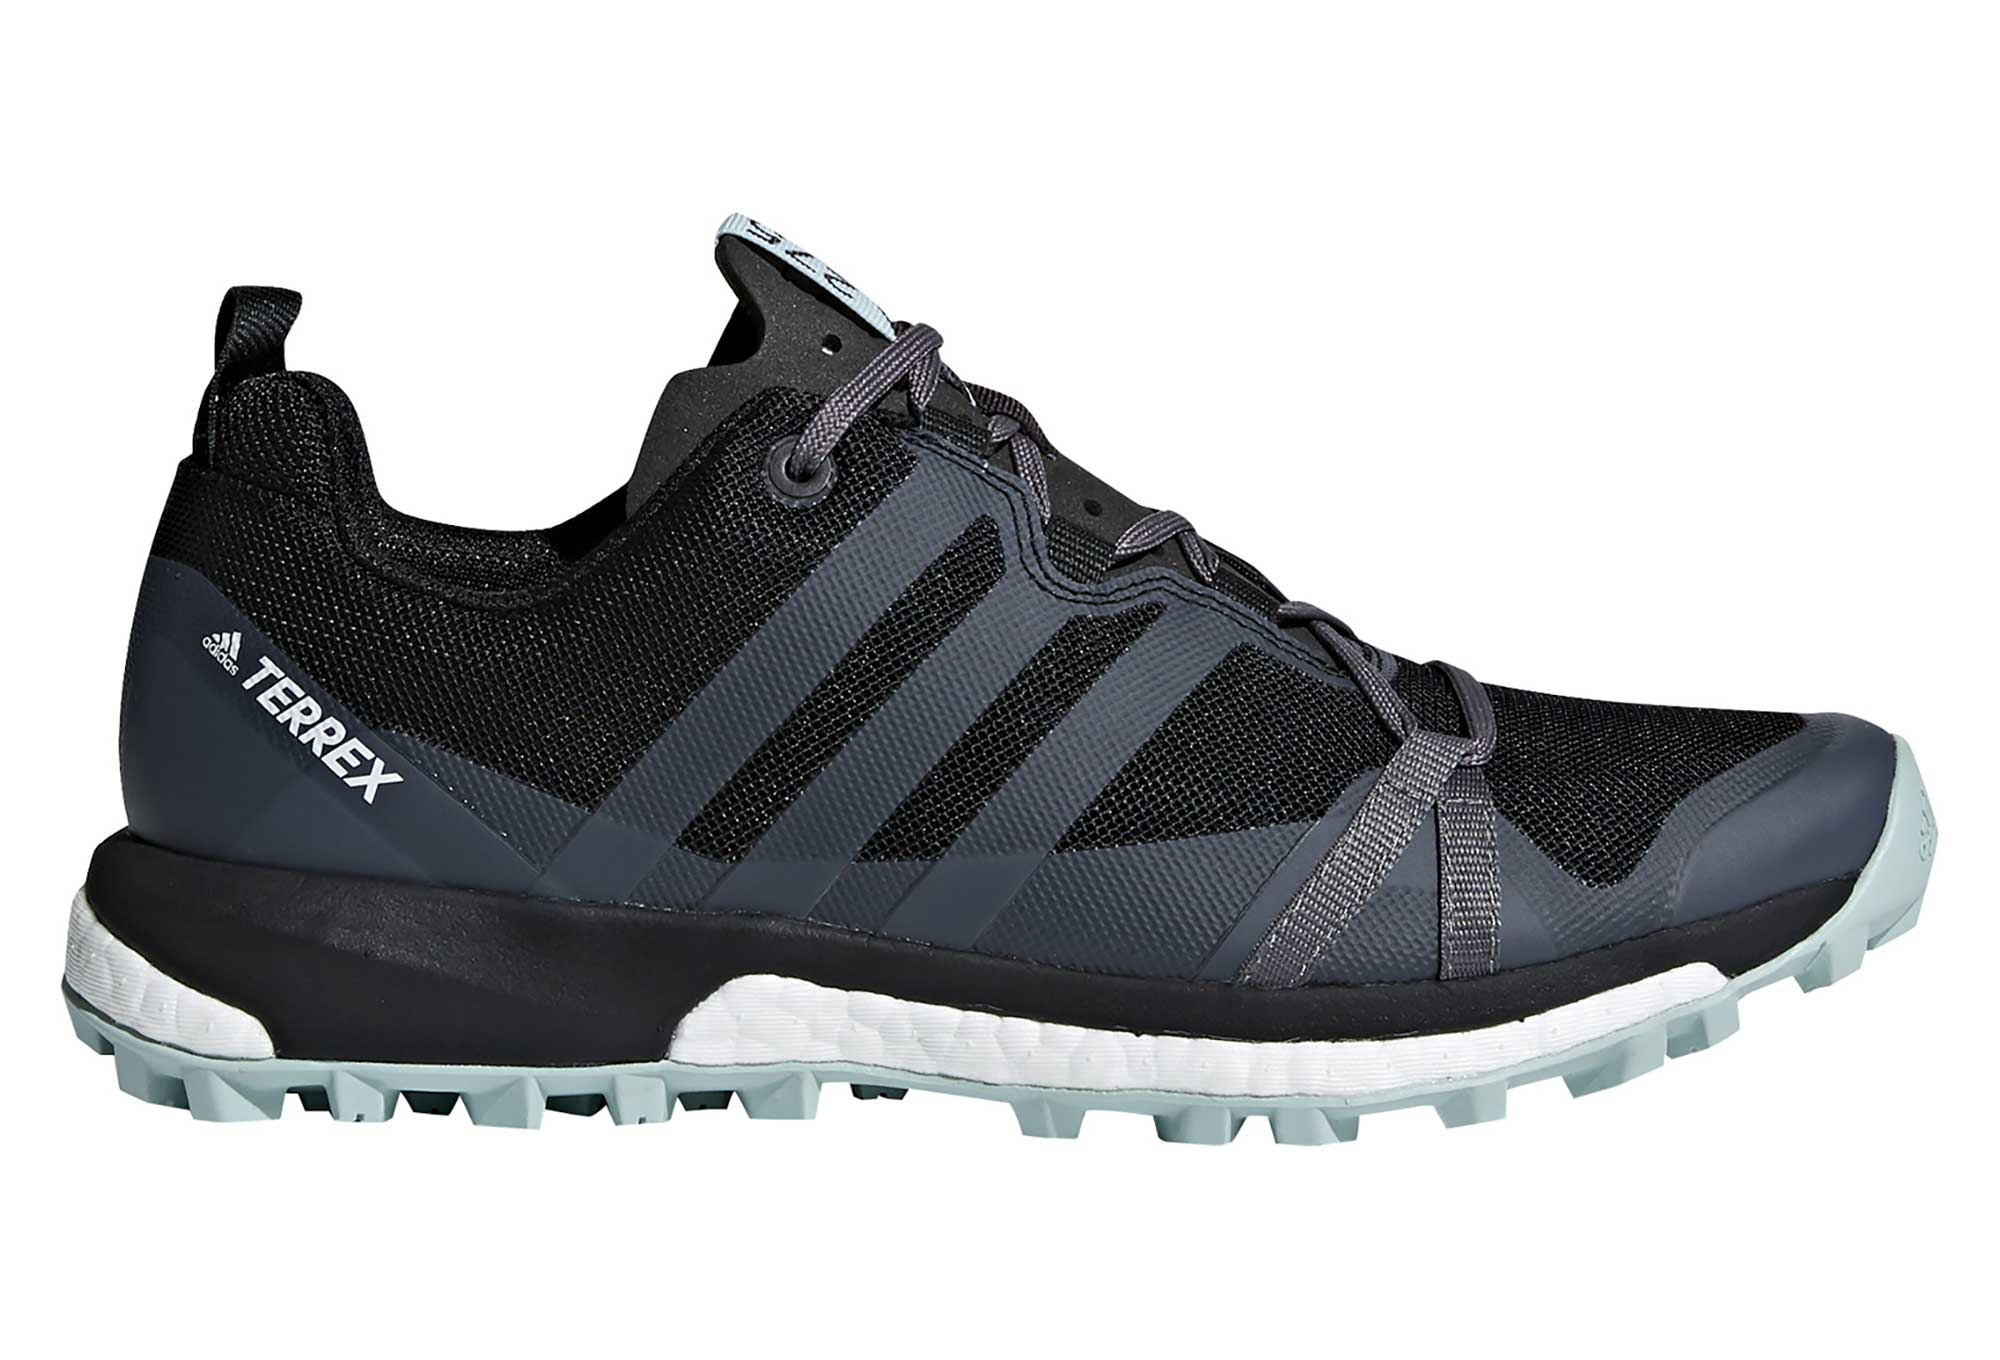 Agravic Corriendo Adidas Terrex Negro Azul ymv8nwOPN0